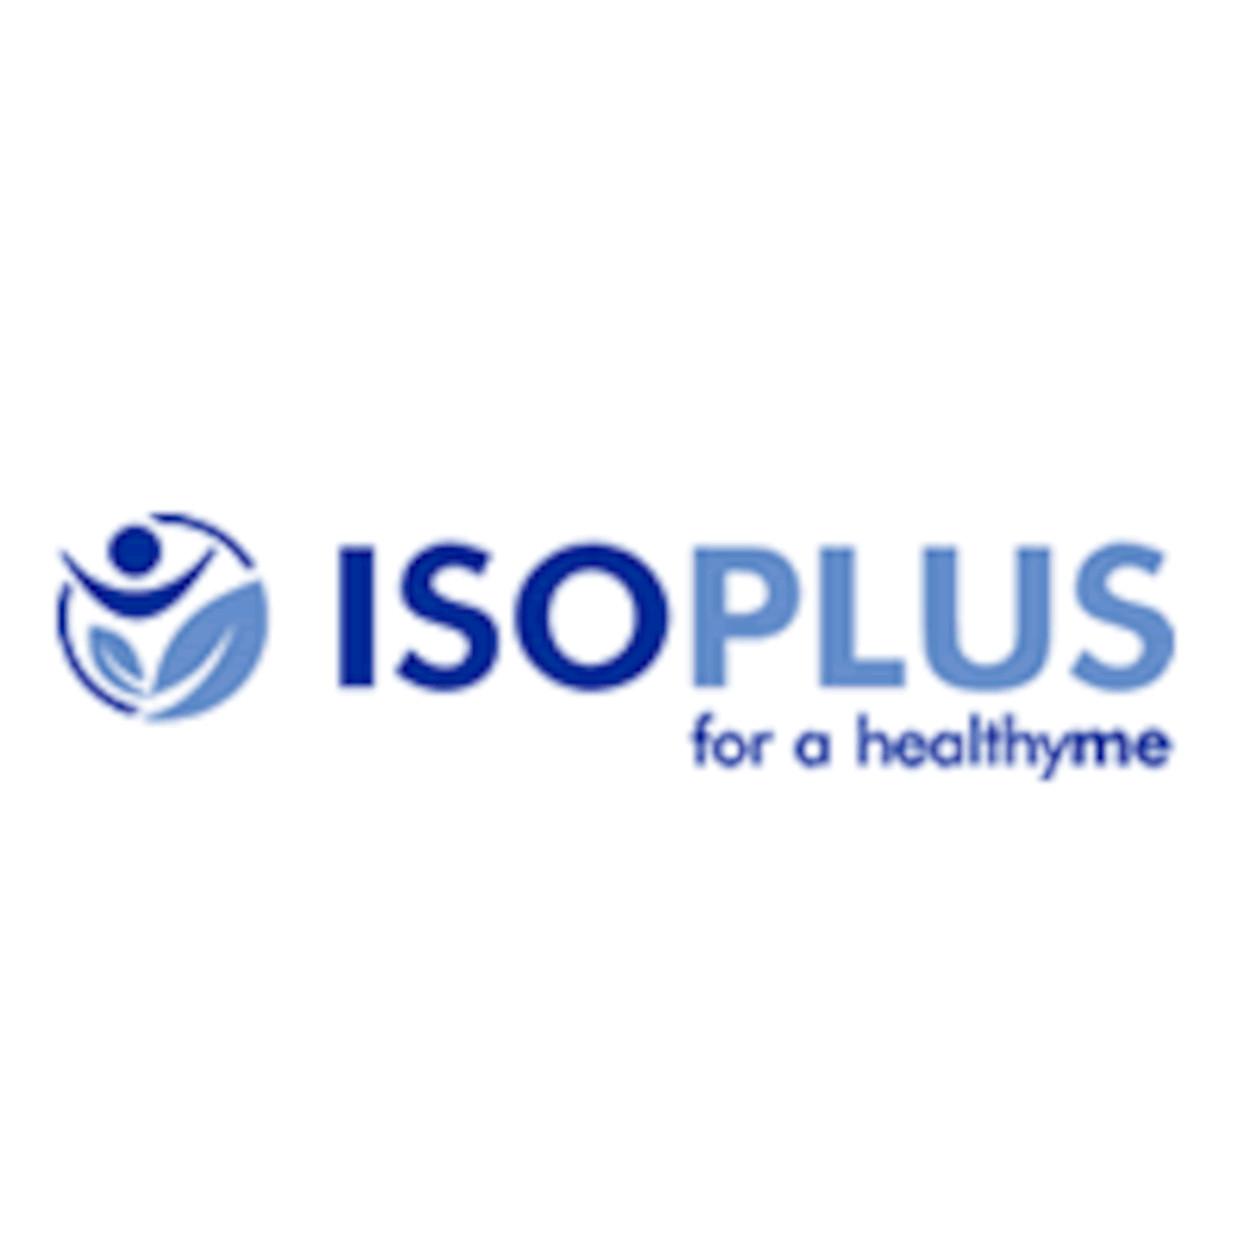 Isoplus: Τροχιά ανάπτυξης και εταιρική αναδιοργάνωση